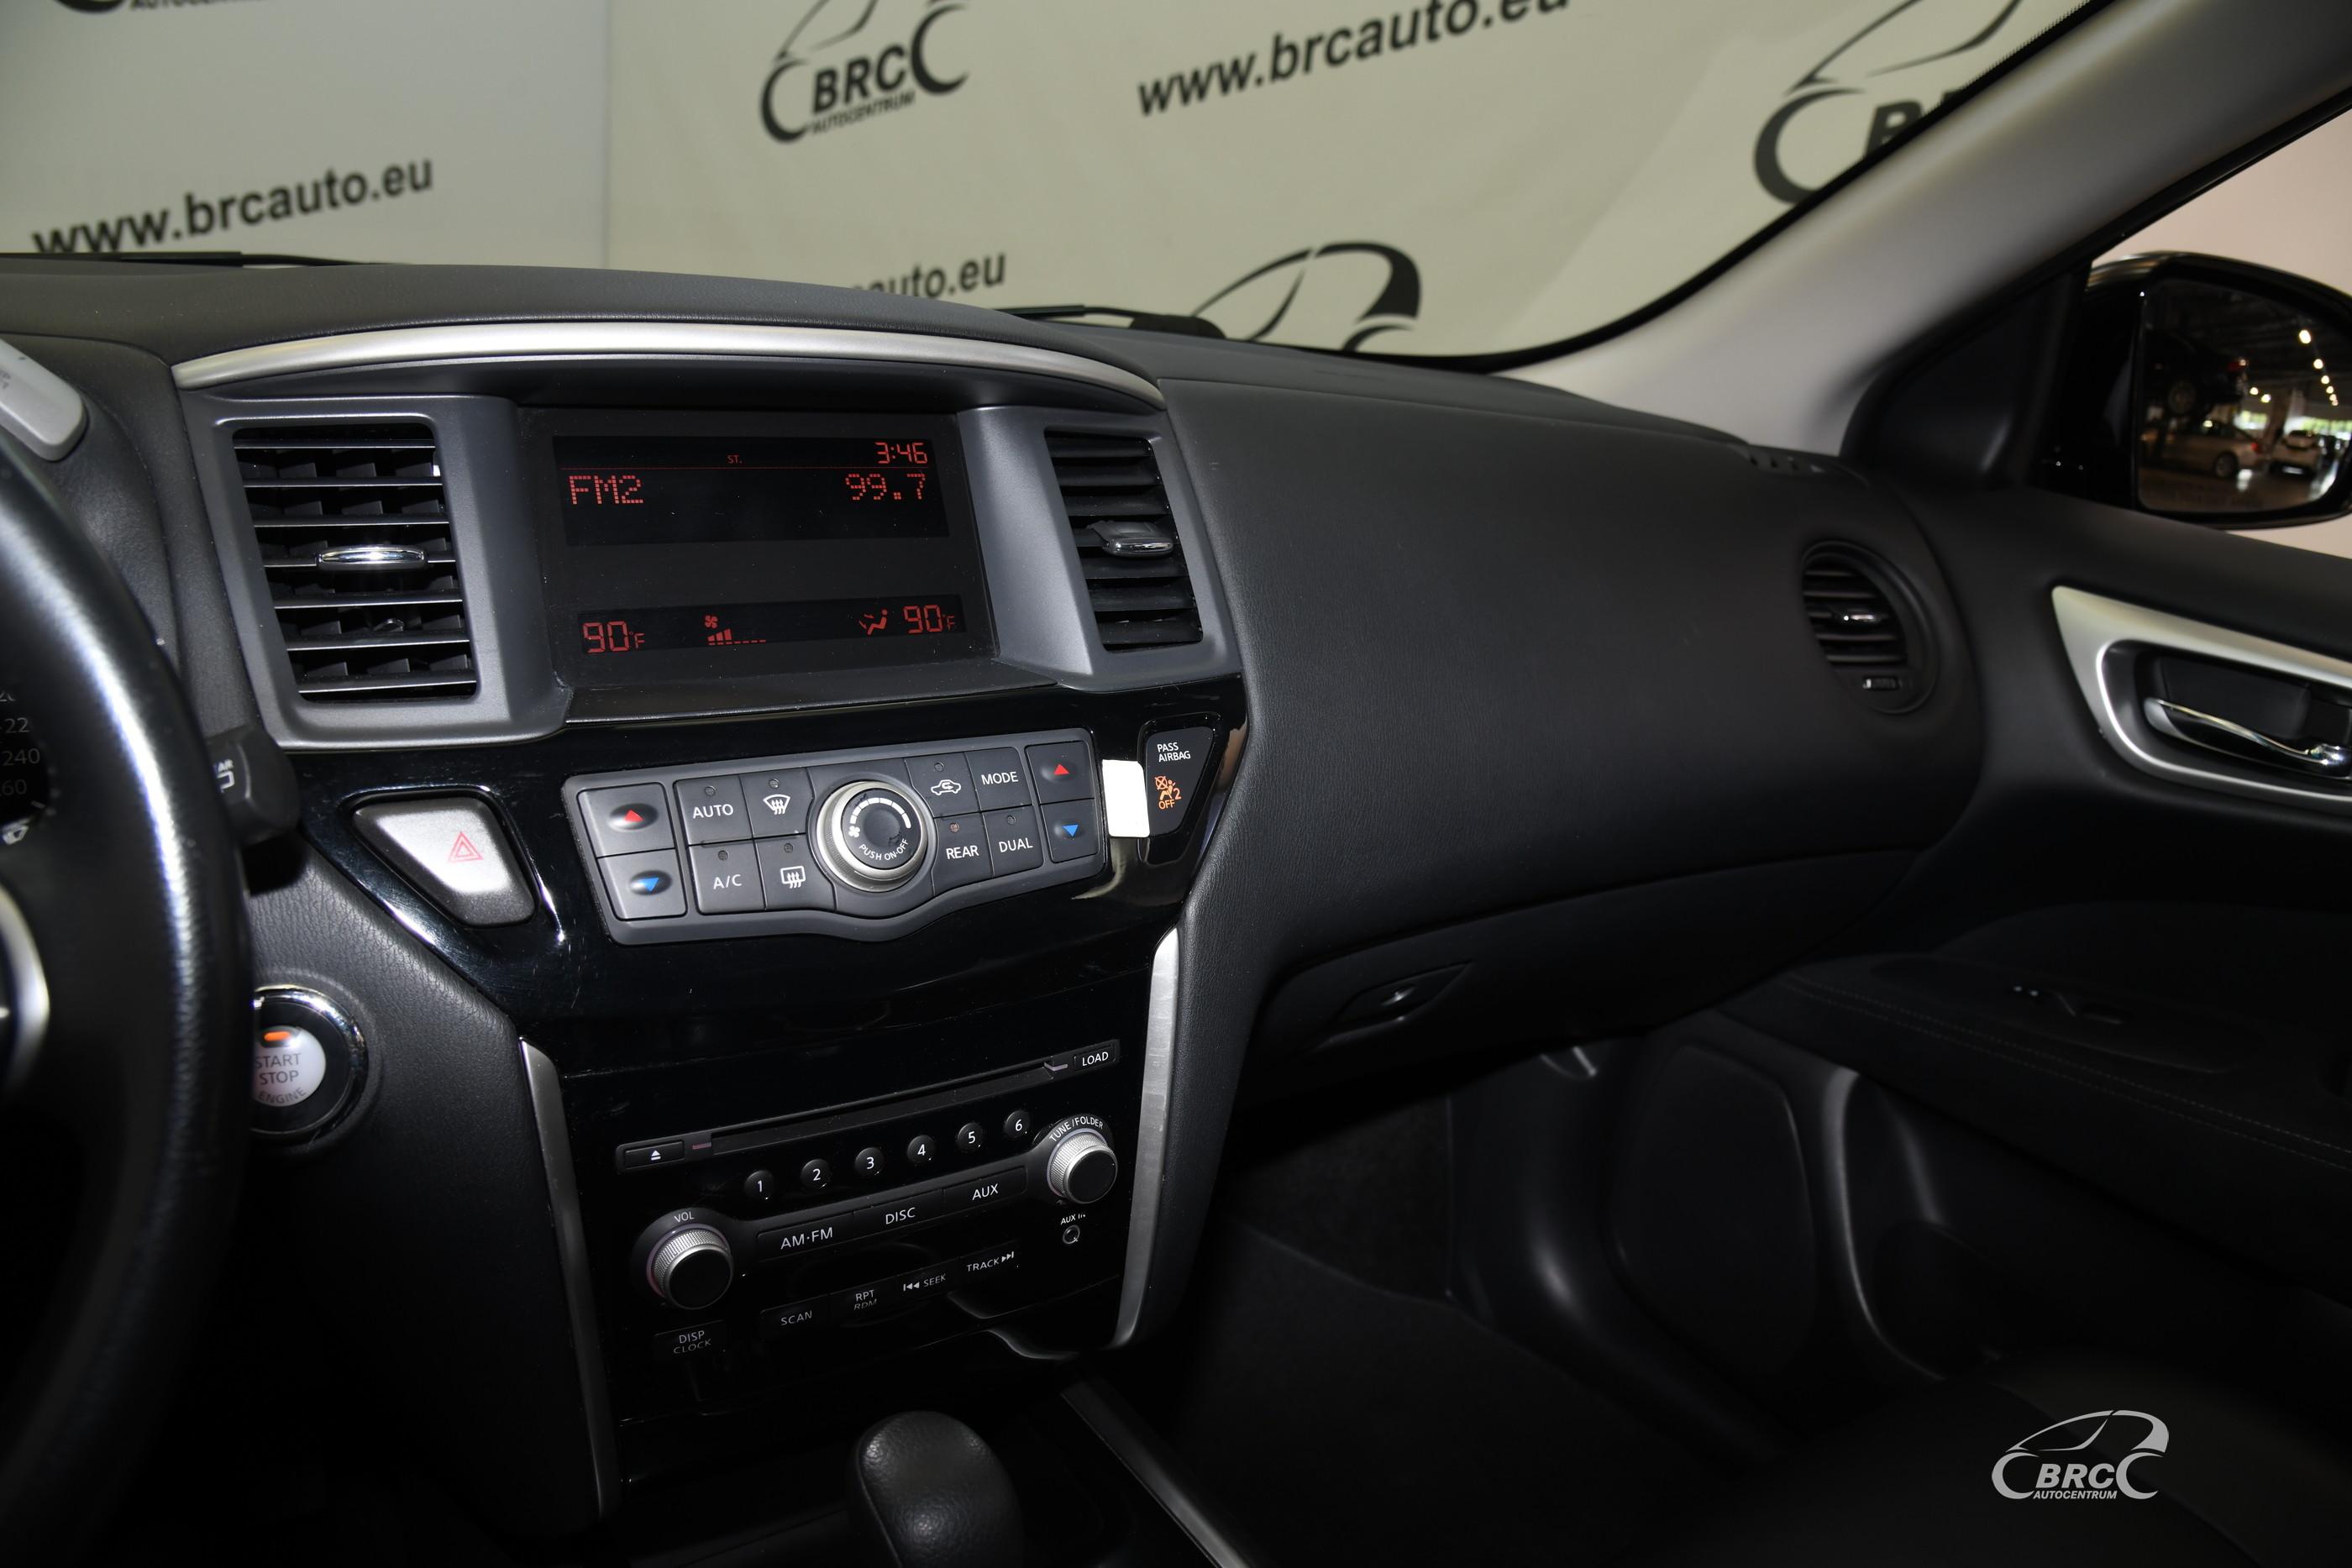 Nissan Pathfinder 3.5 V6 4WD Automatas